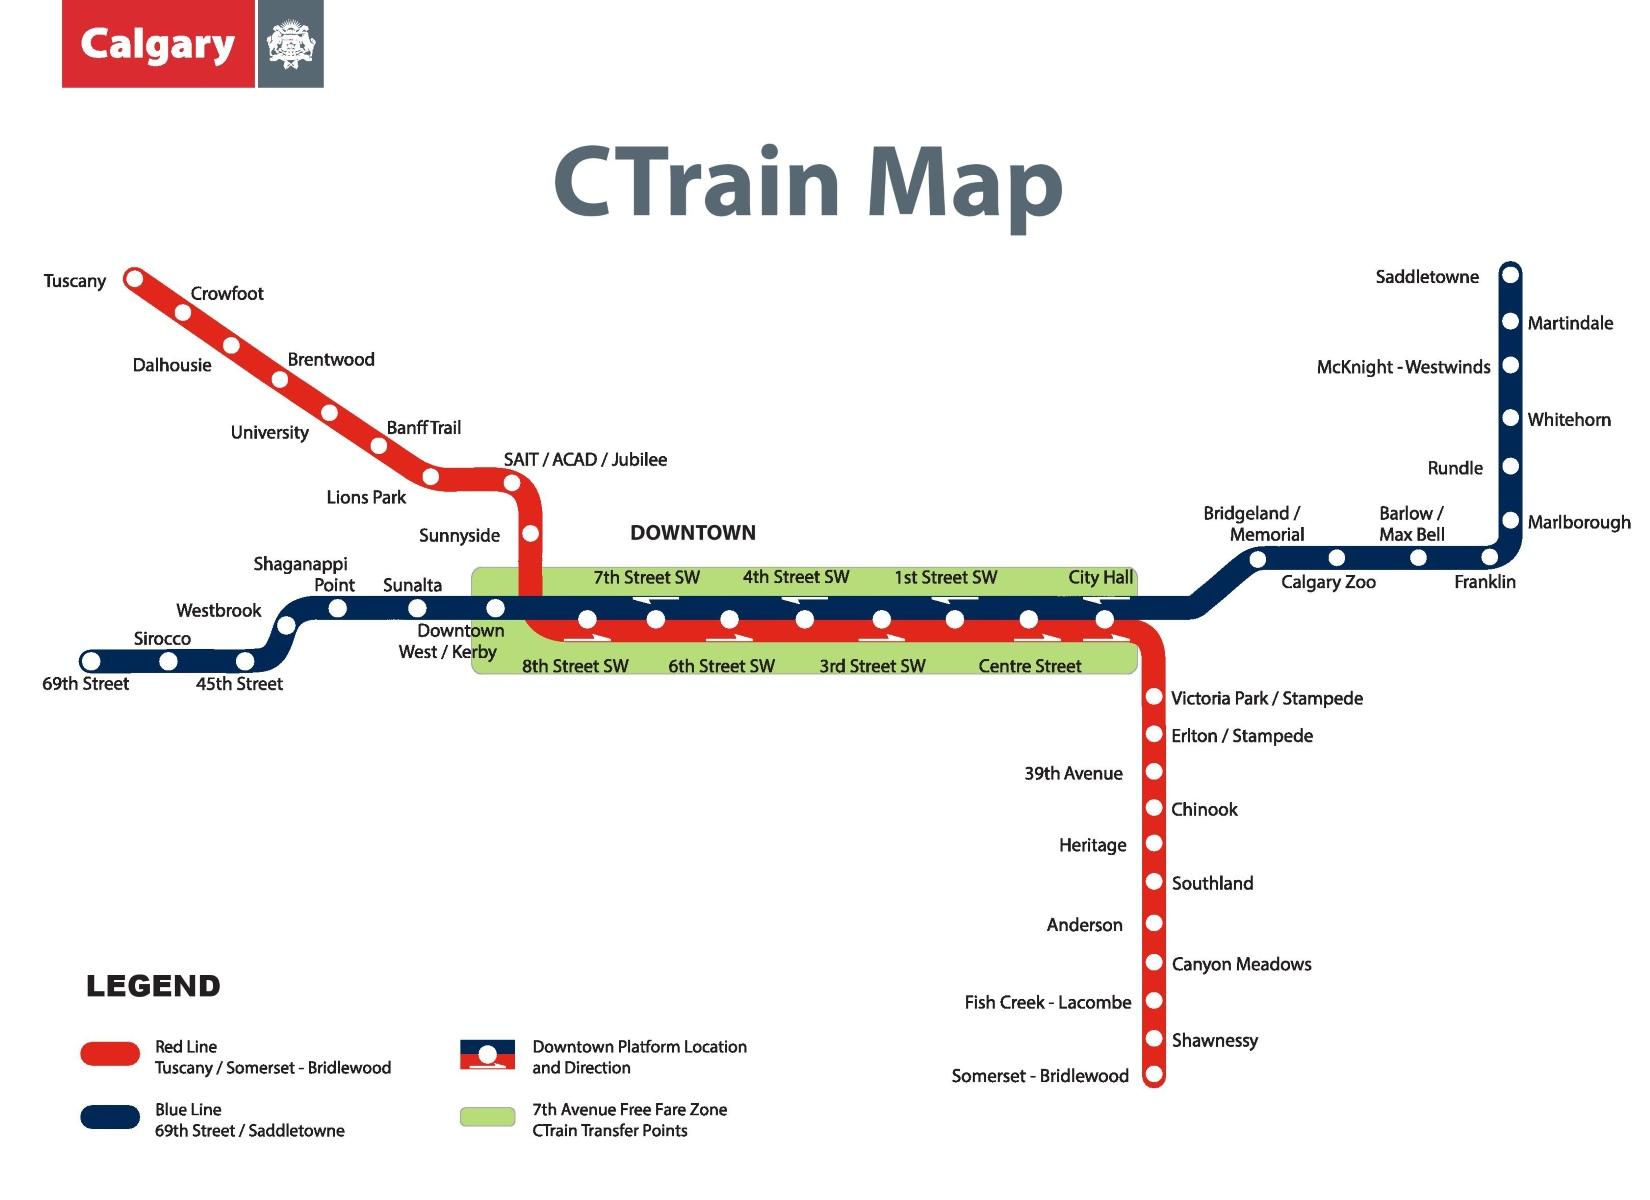 Calgary CTrain map